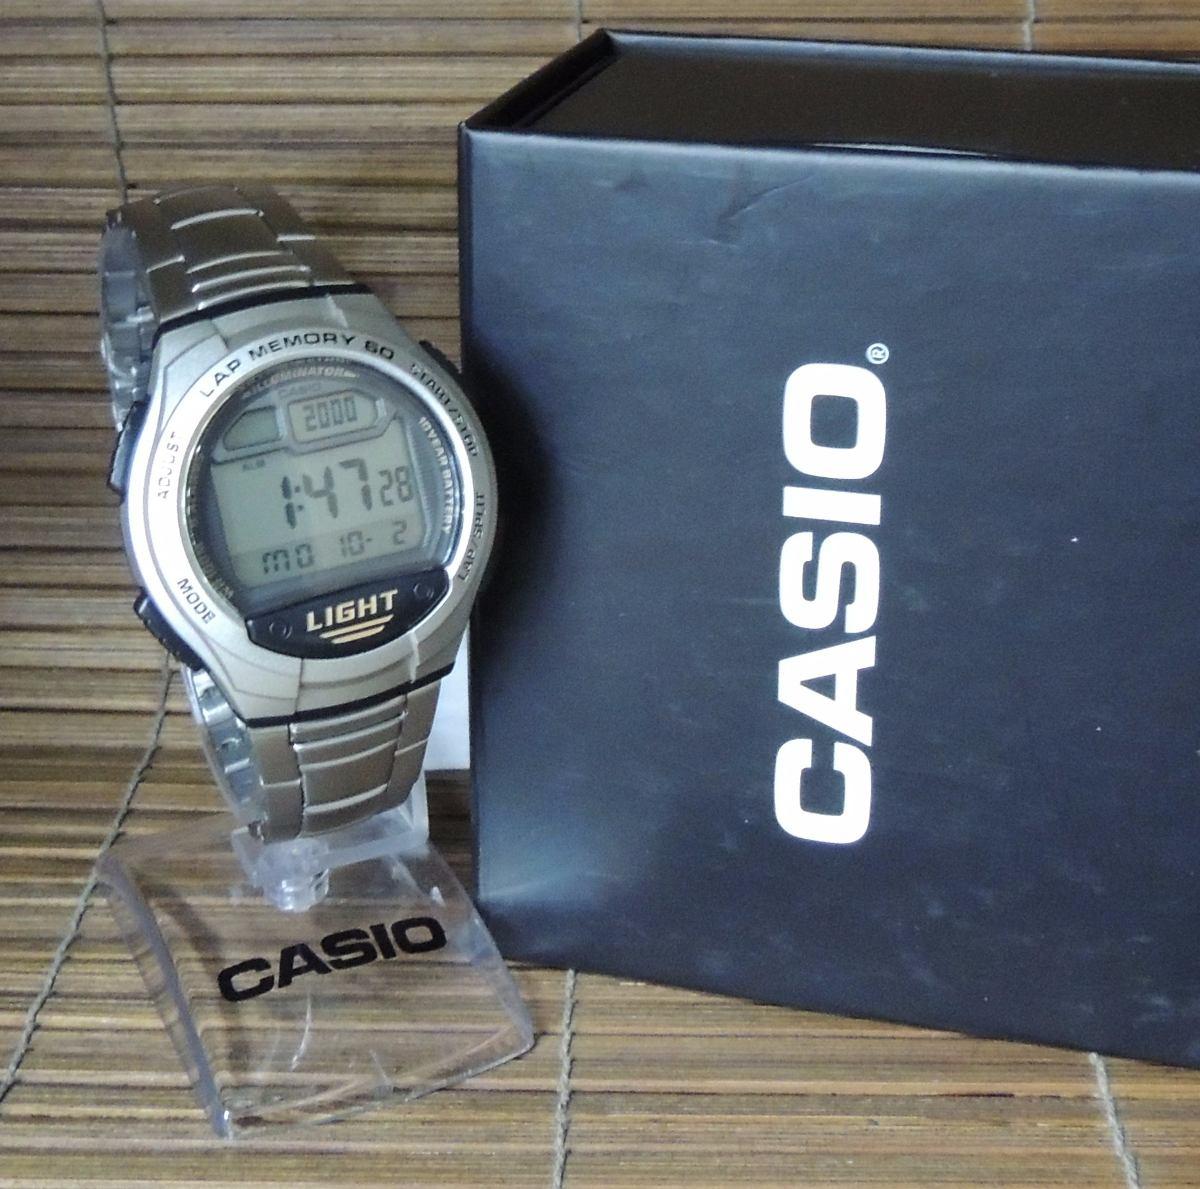 fc250b67838 Relógio Casio Modelo  W-734d-1avdf - Nf + 1 Ano Garantia - R  249